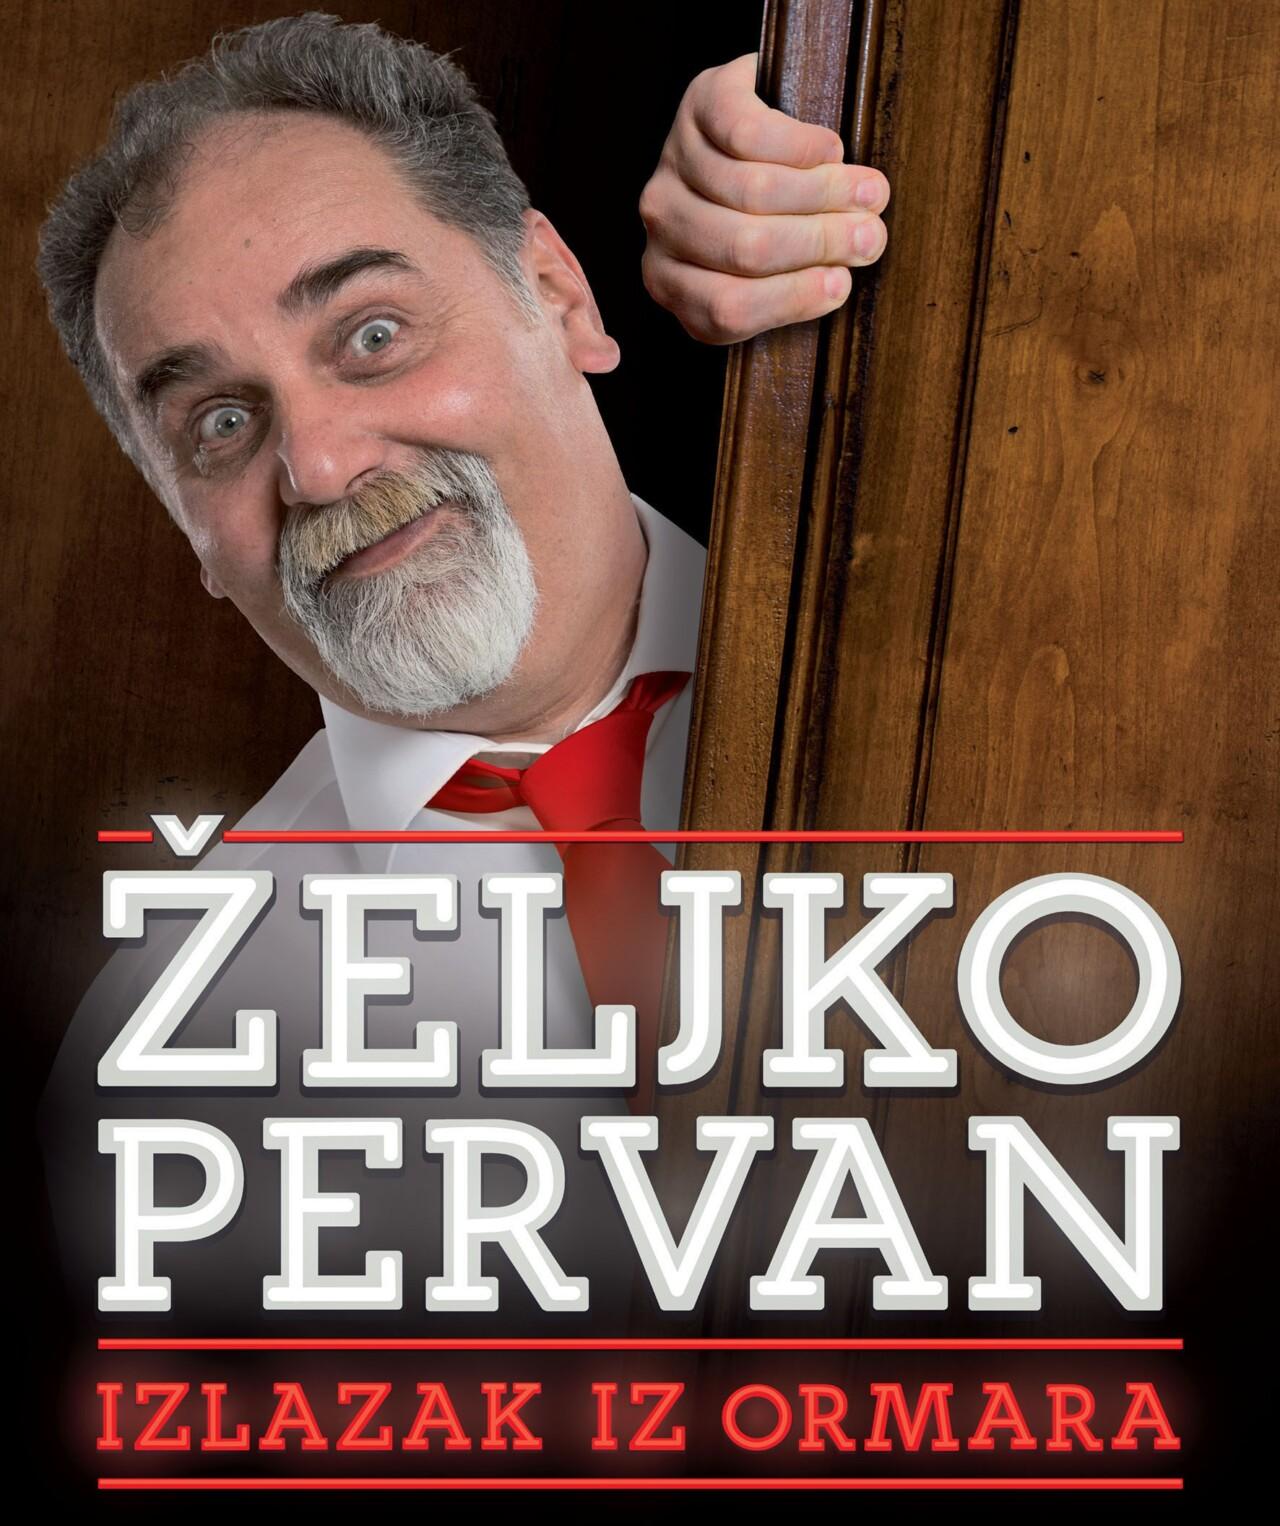 Željko Pervan - Izlazak iz ormara